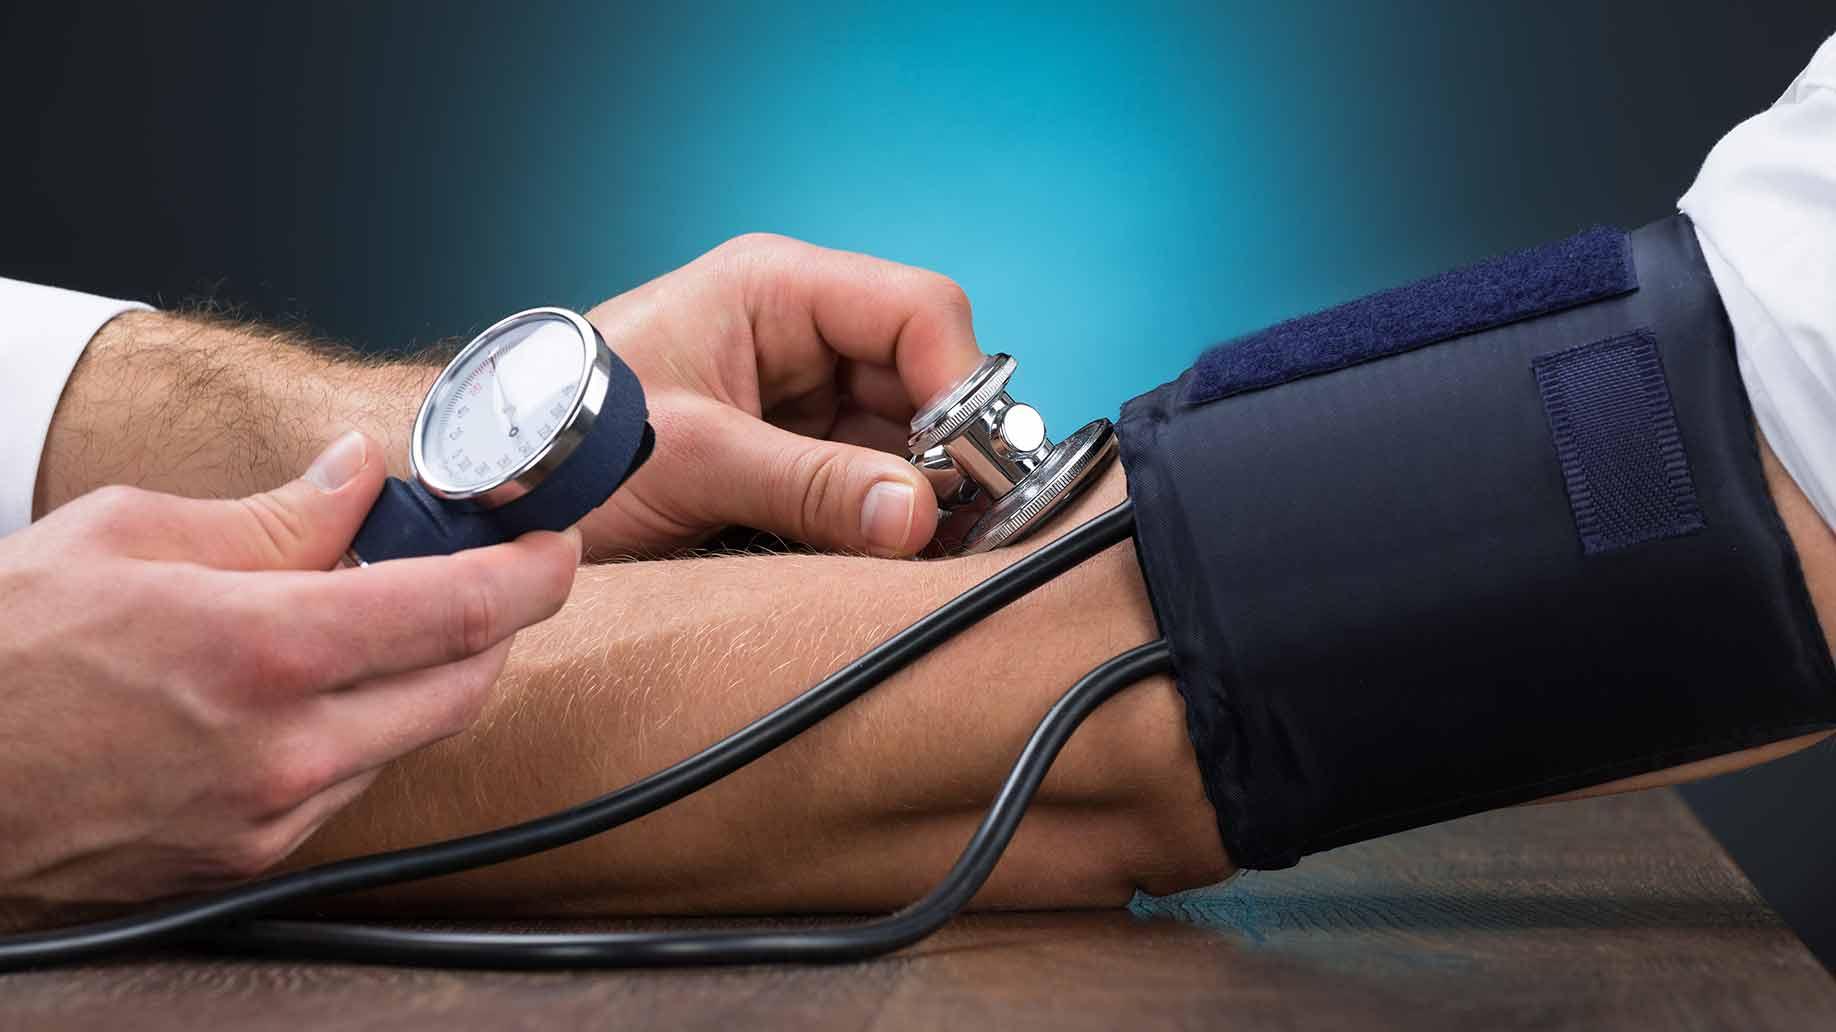 high blood pressure vitamin c natural health benefits